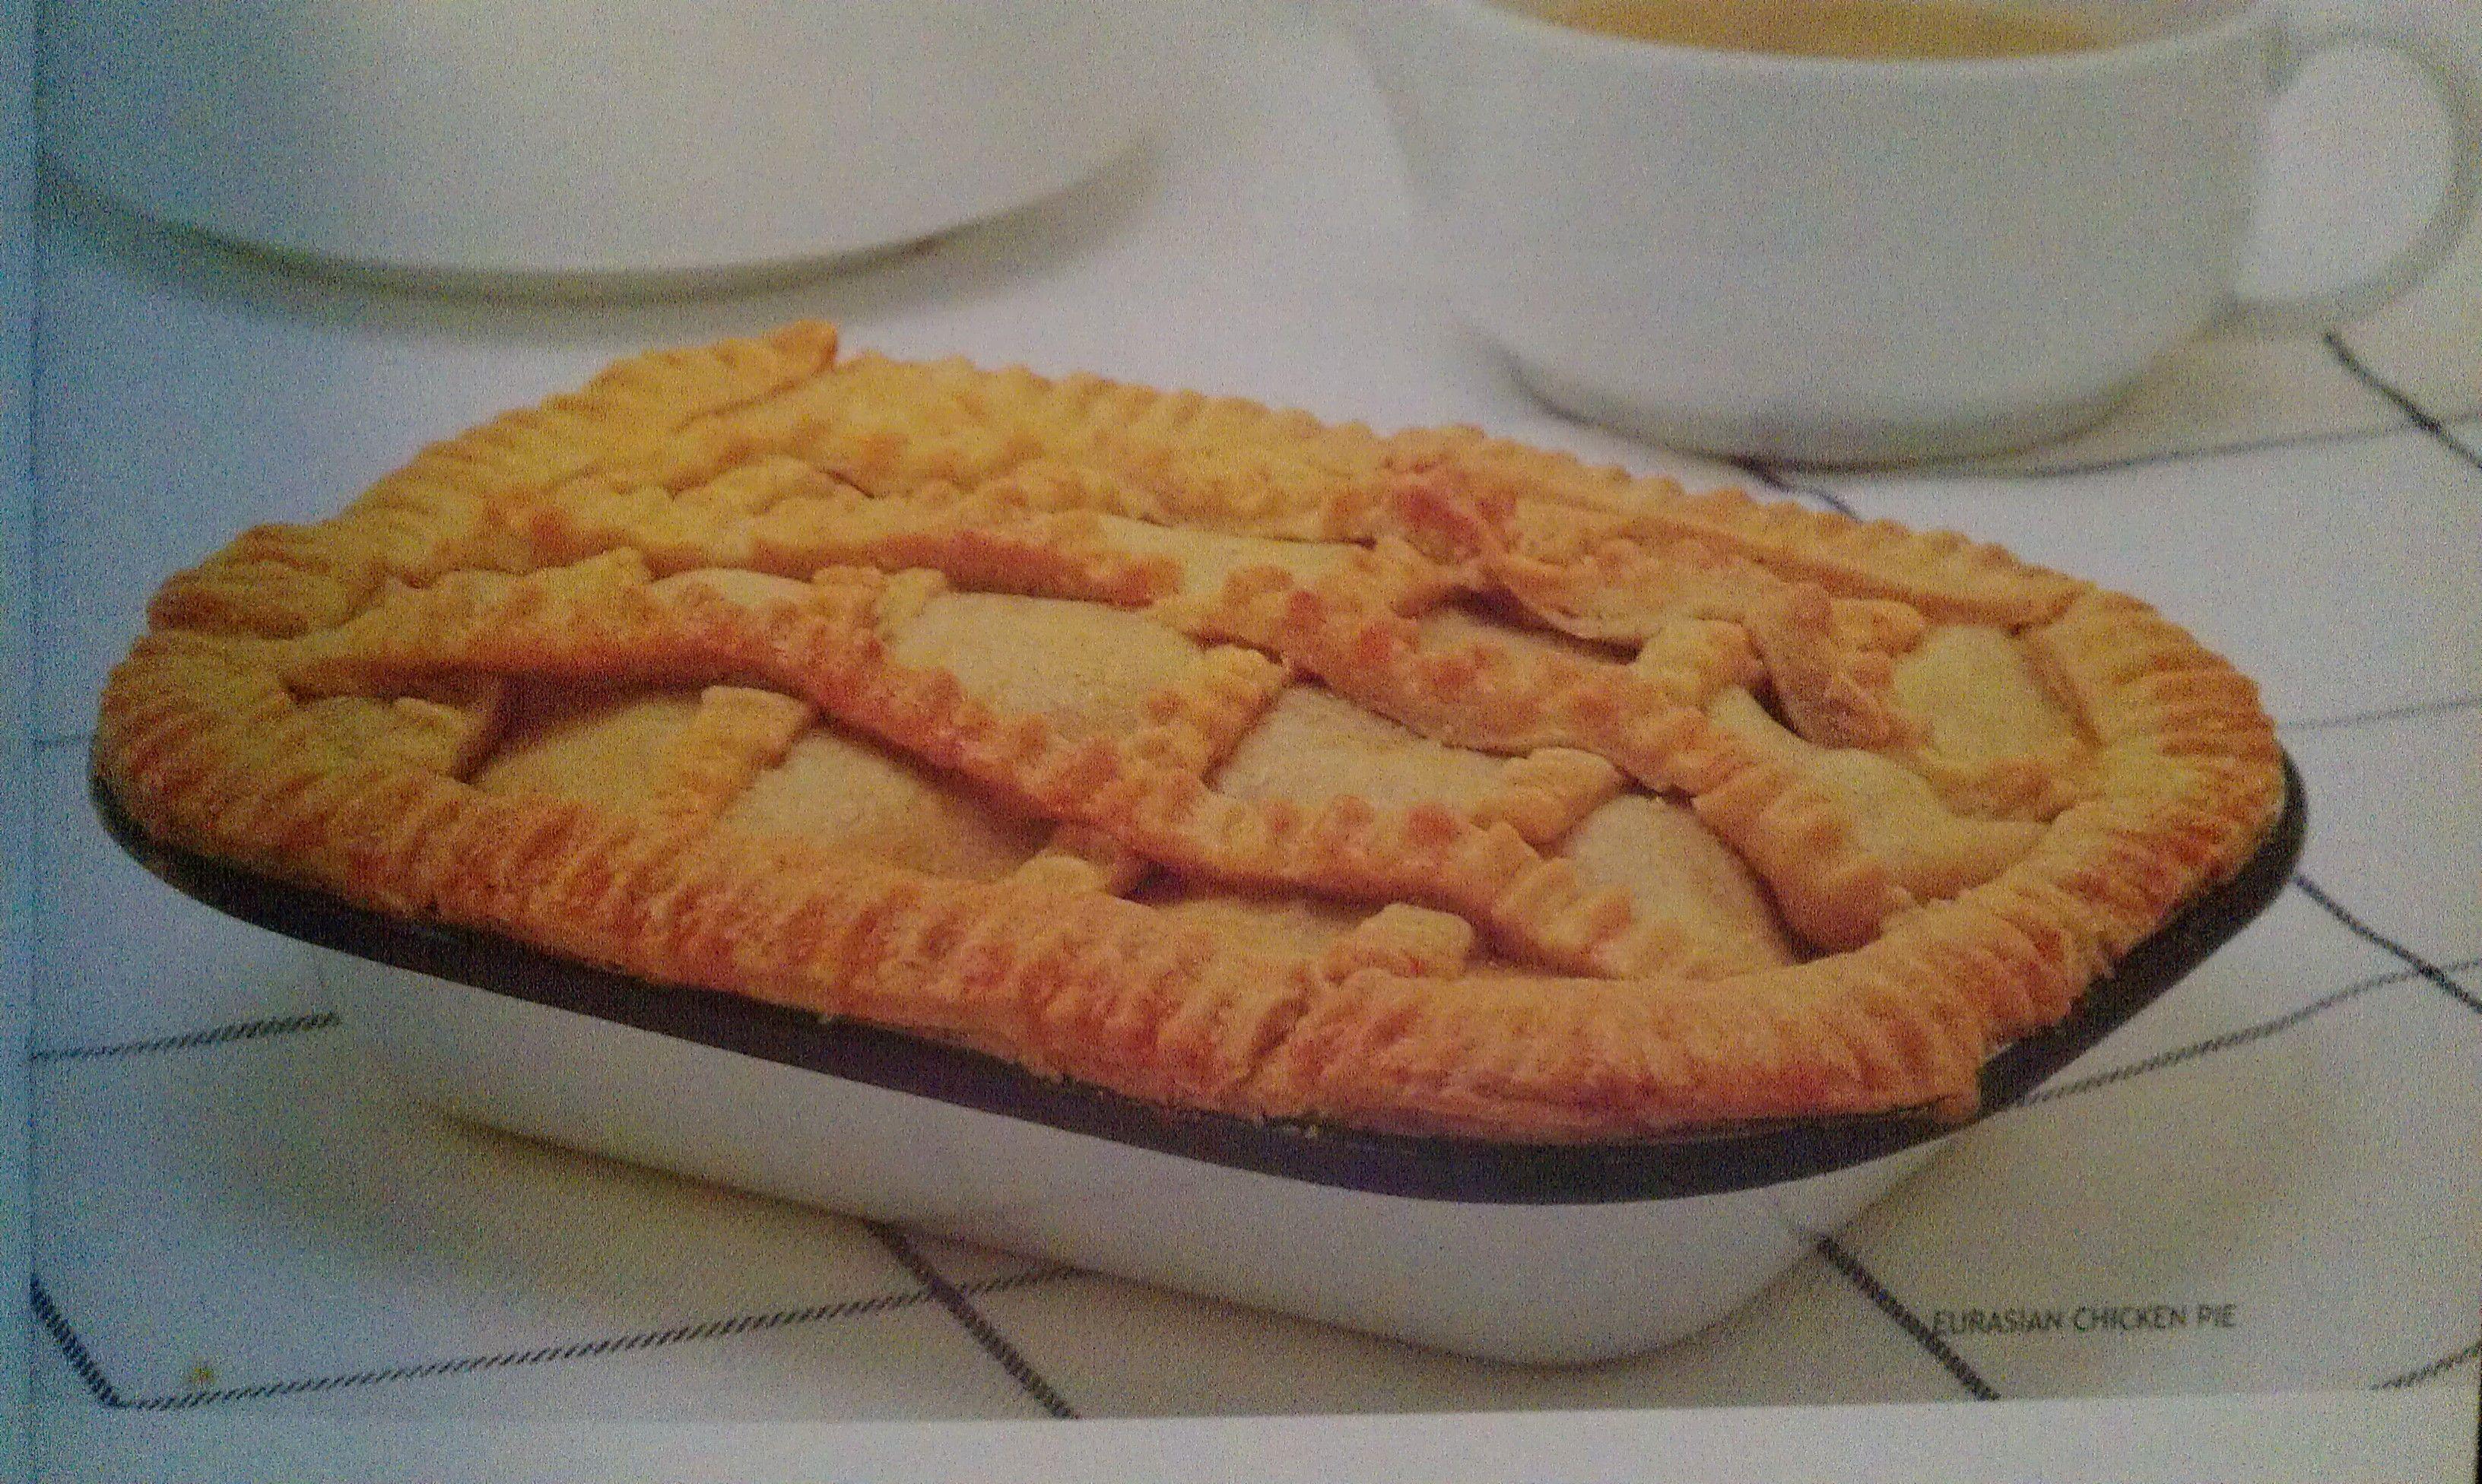 Chicken pie mary gomez the eurasian cookbook eurasian food food forumfinder Choice Image